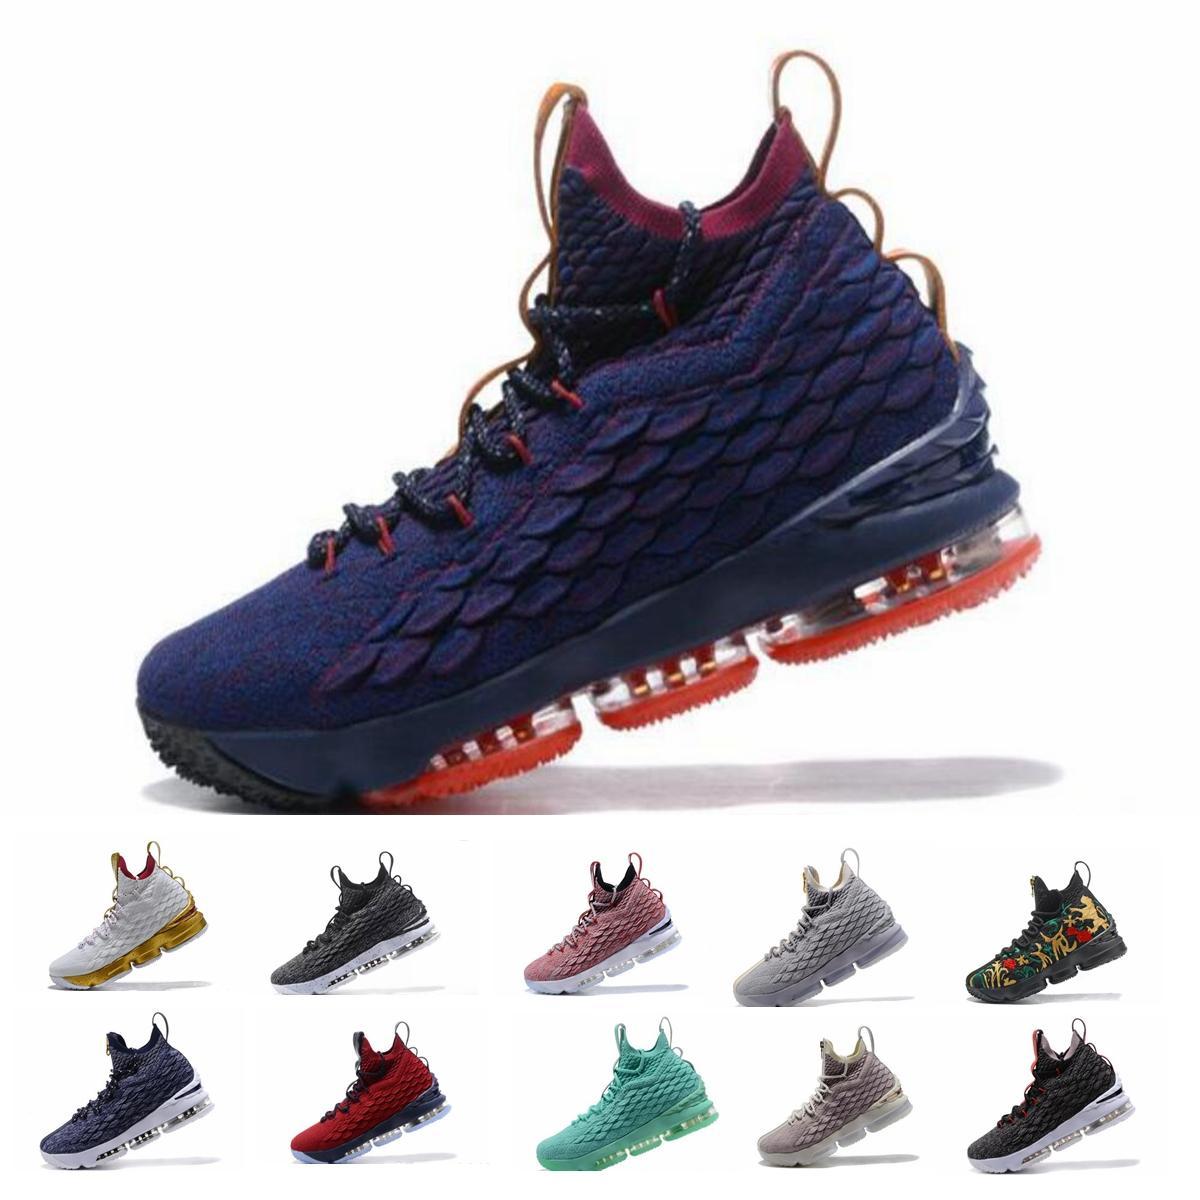 LeBron 15 Basketball Shoe in 2019 | Adidas basketball shoes